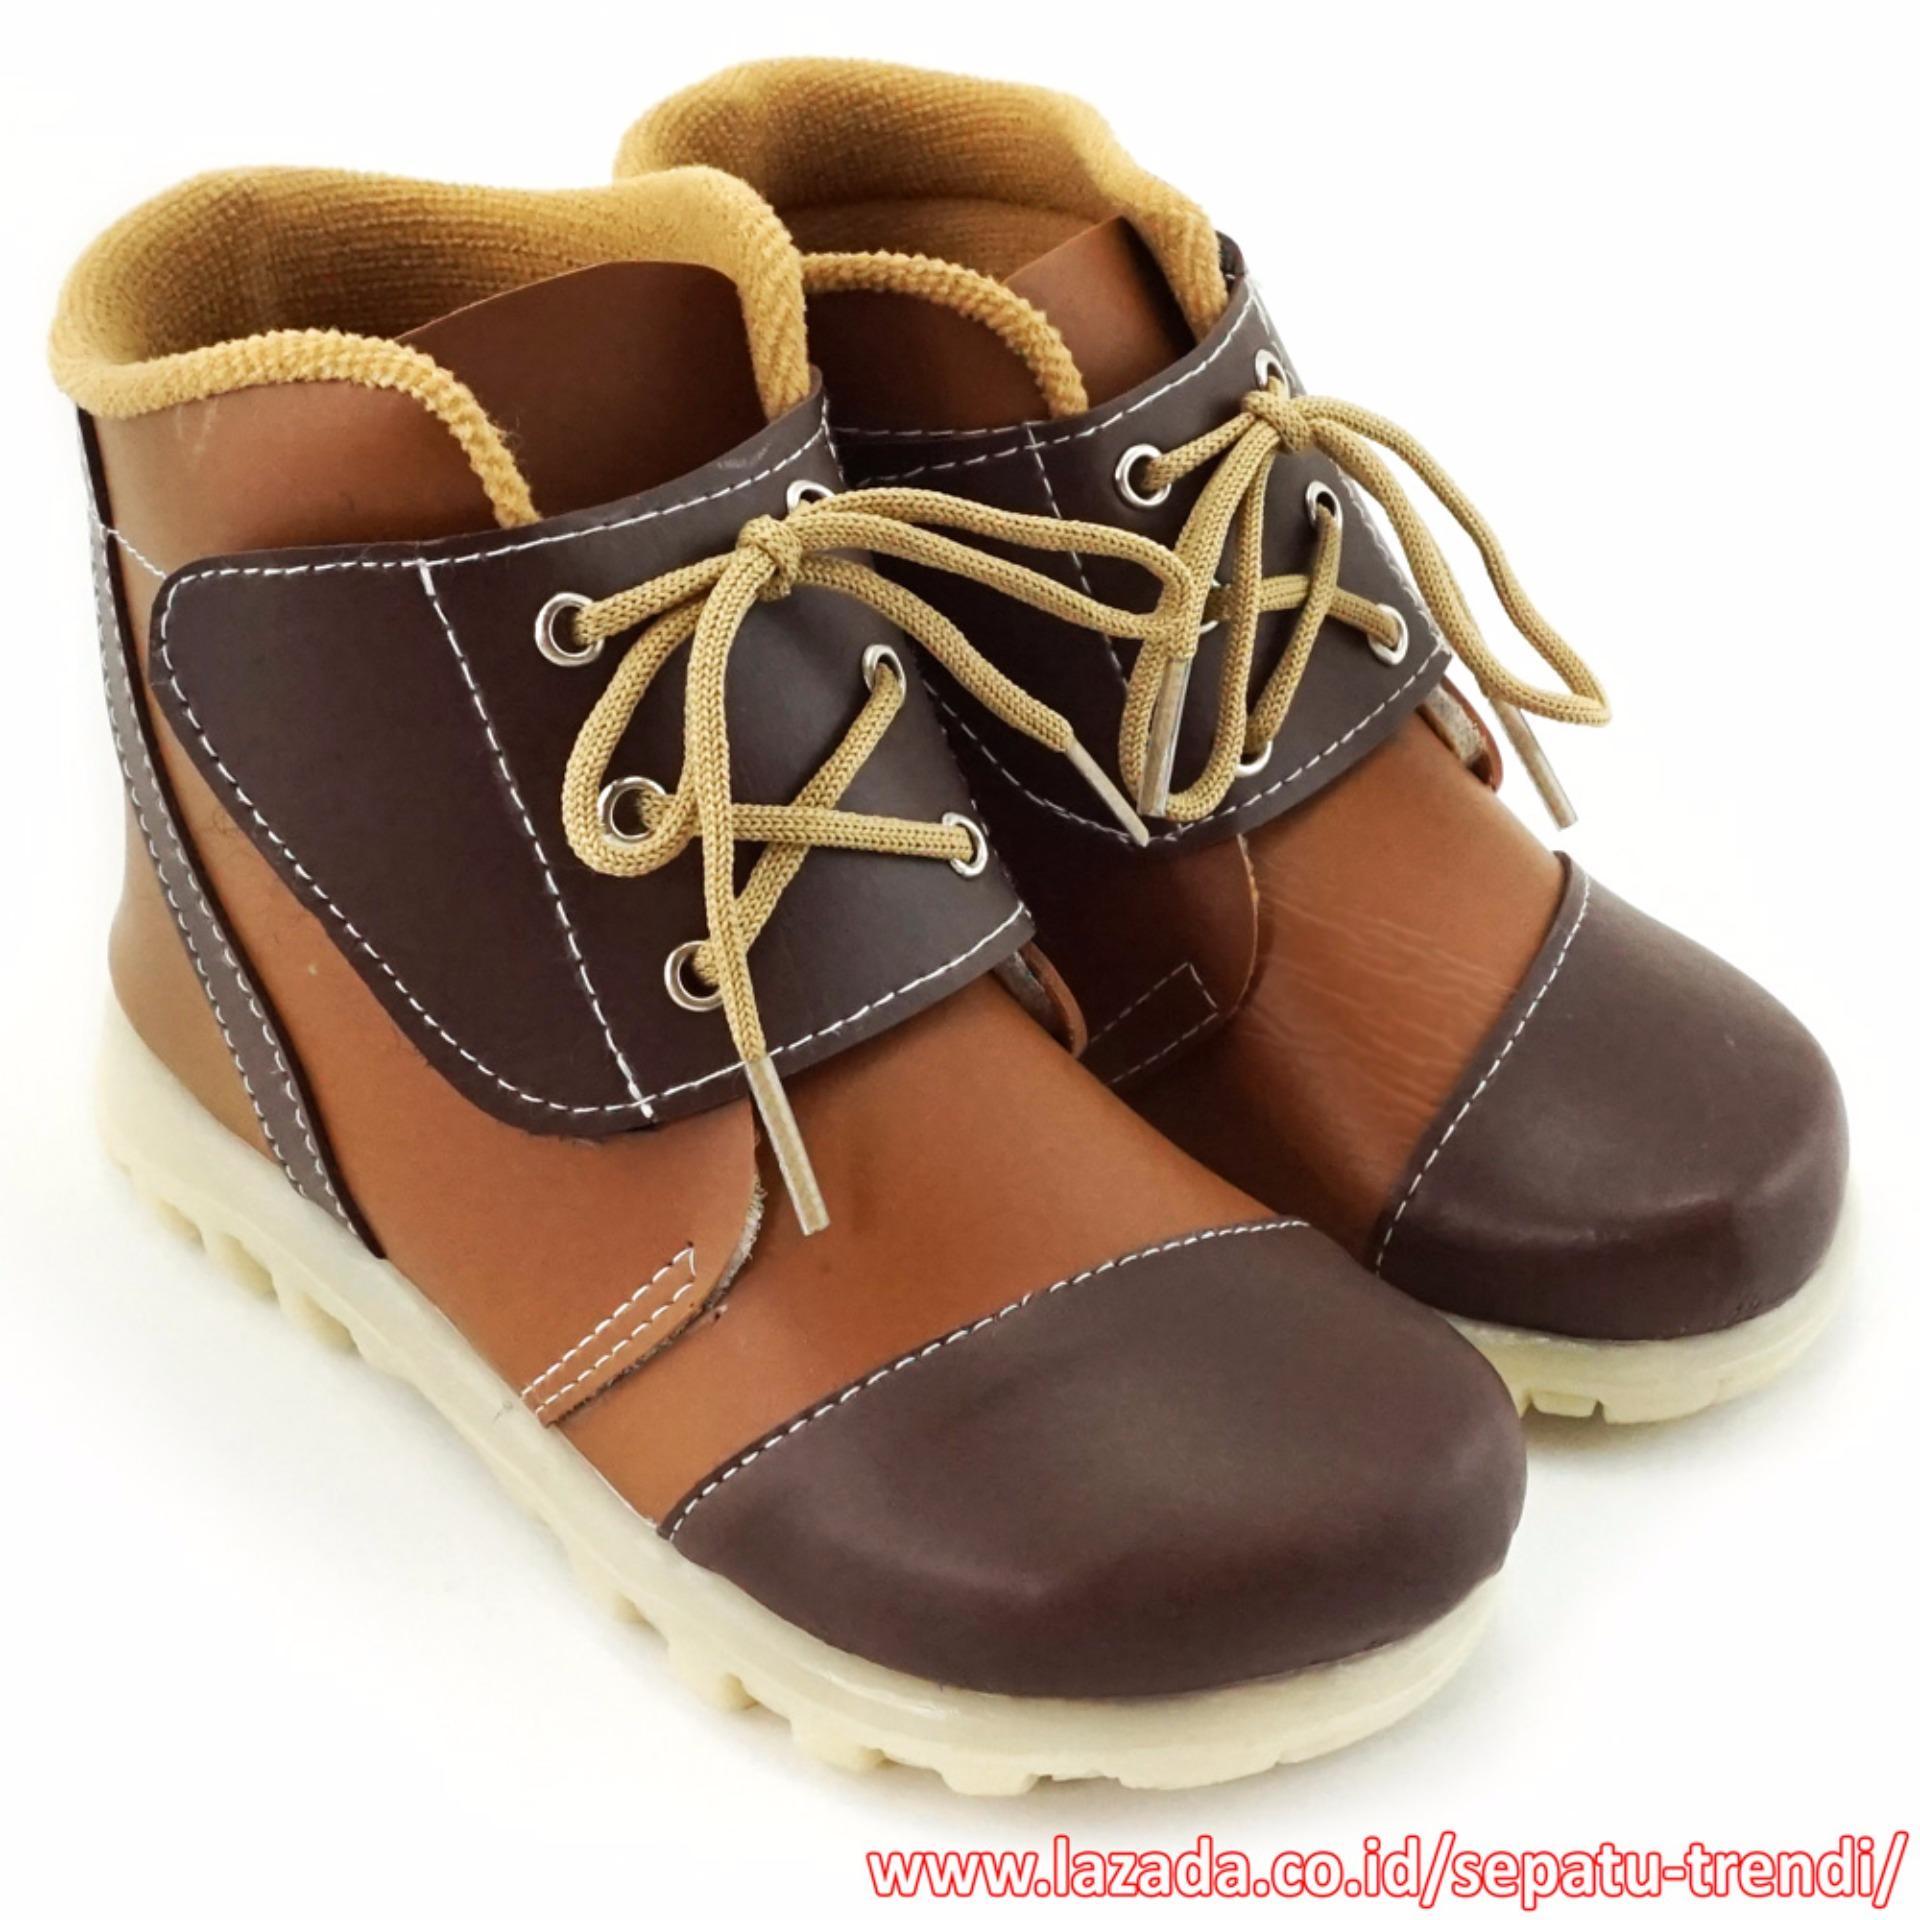 Beli Trendishoes Sepatu Boot Anak Velcro Strap Aksesori Tali 3Lv Cokelat Online